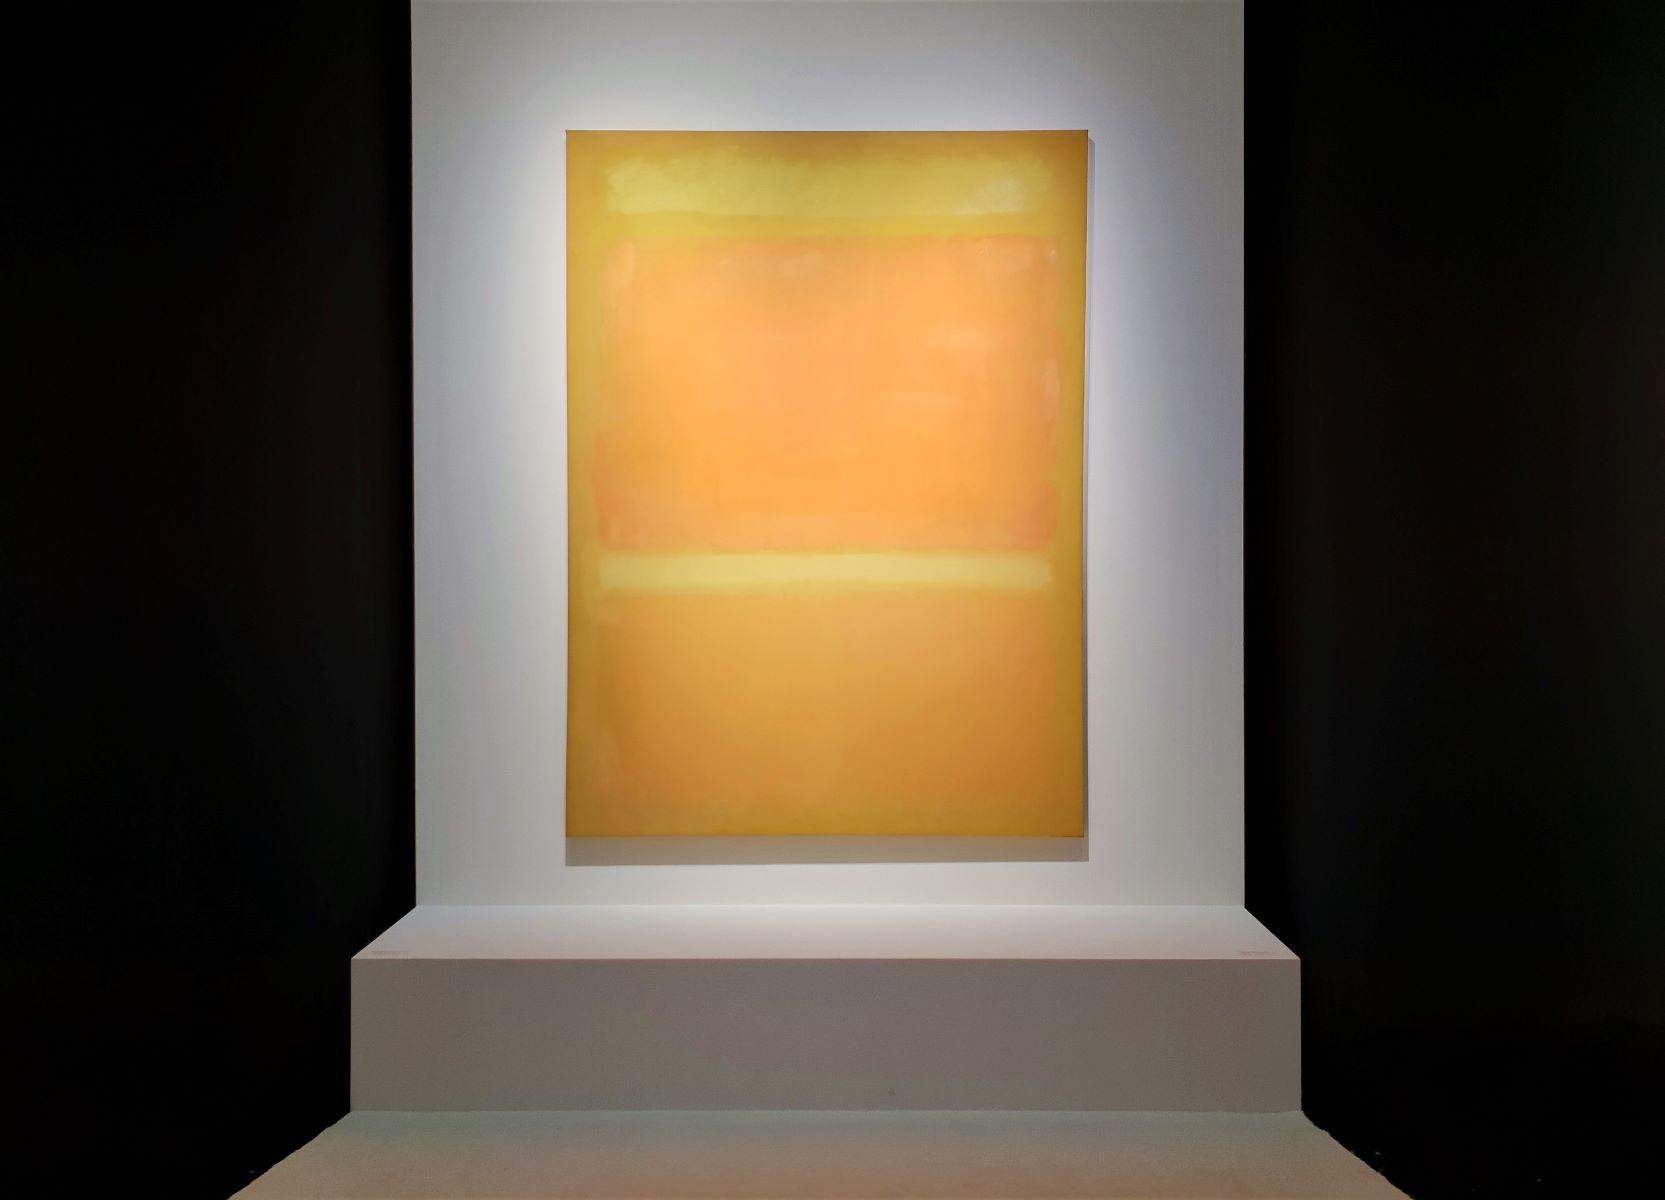 Rothko, Untitled, 1955